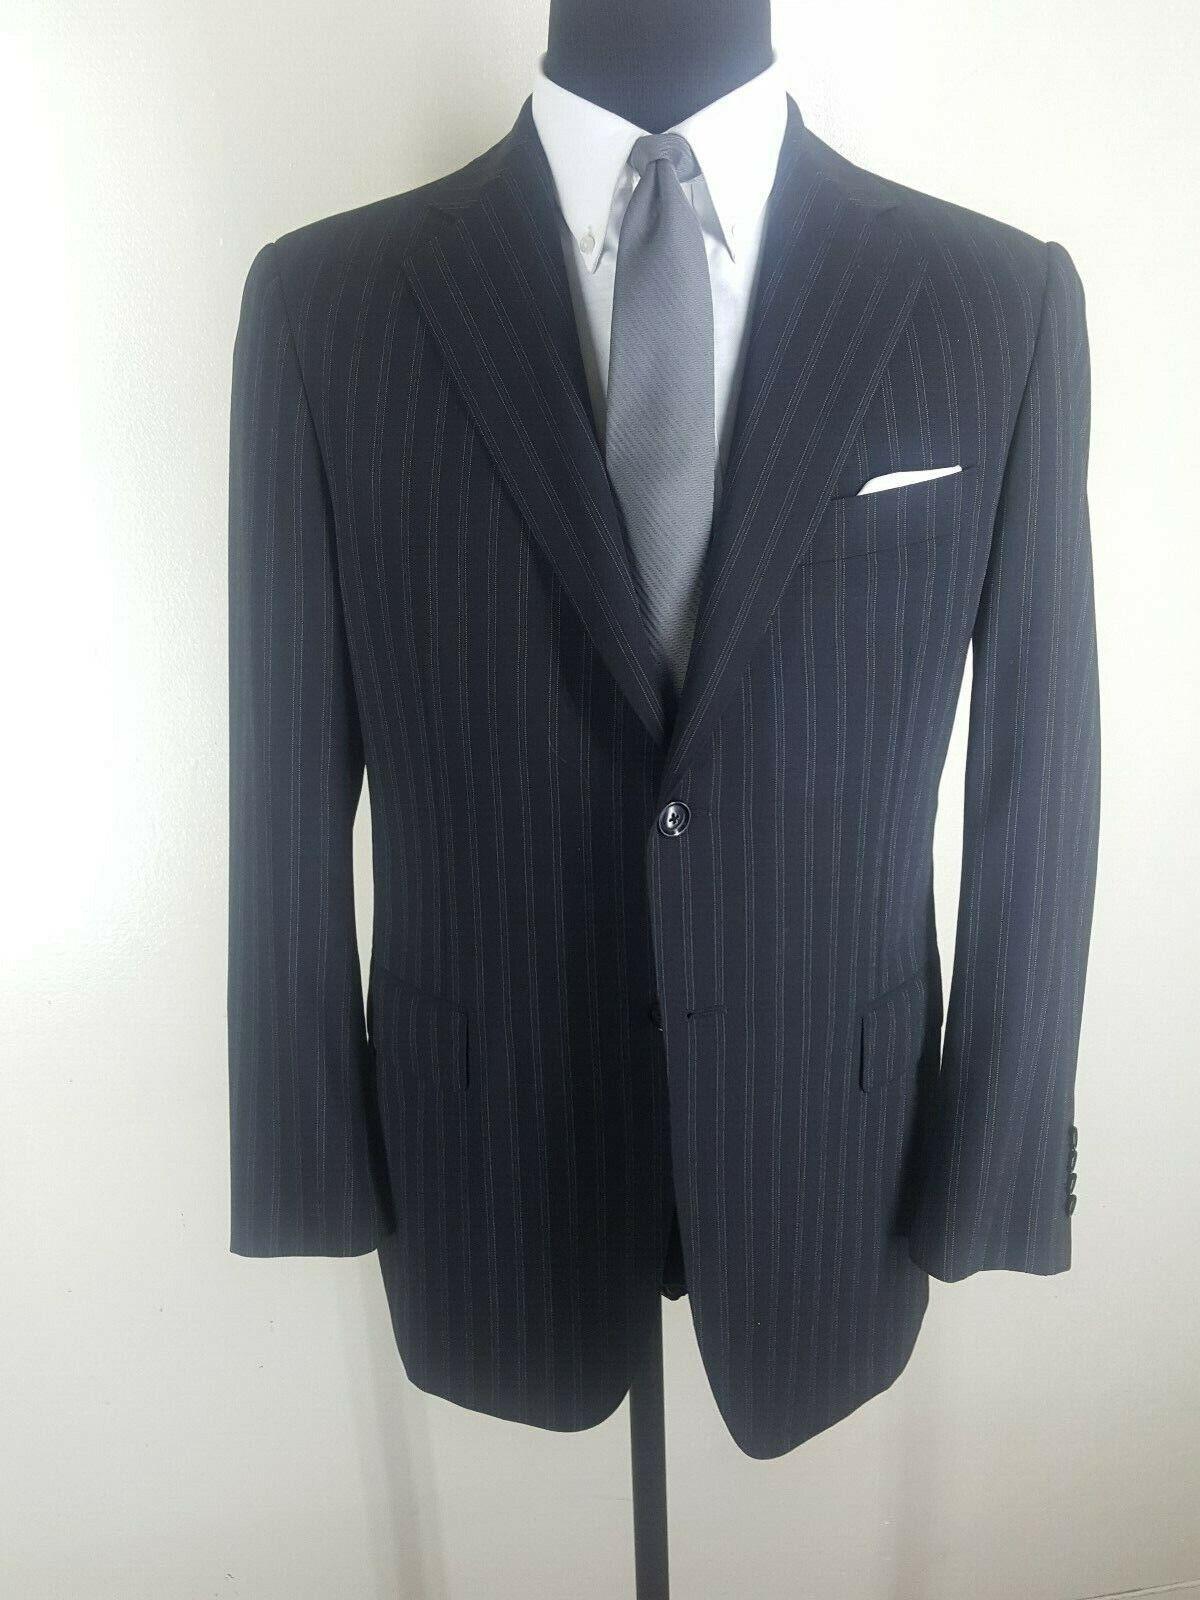 PAL ZILERI Bespoke Vintage 100% Wool  Suit 2 Btn  No Vents 40 R--Fit 40-42 Reg